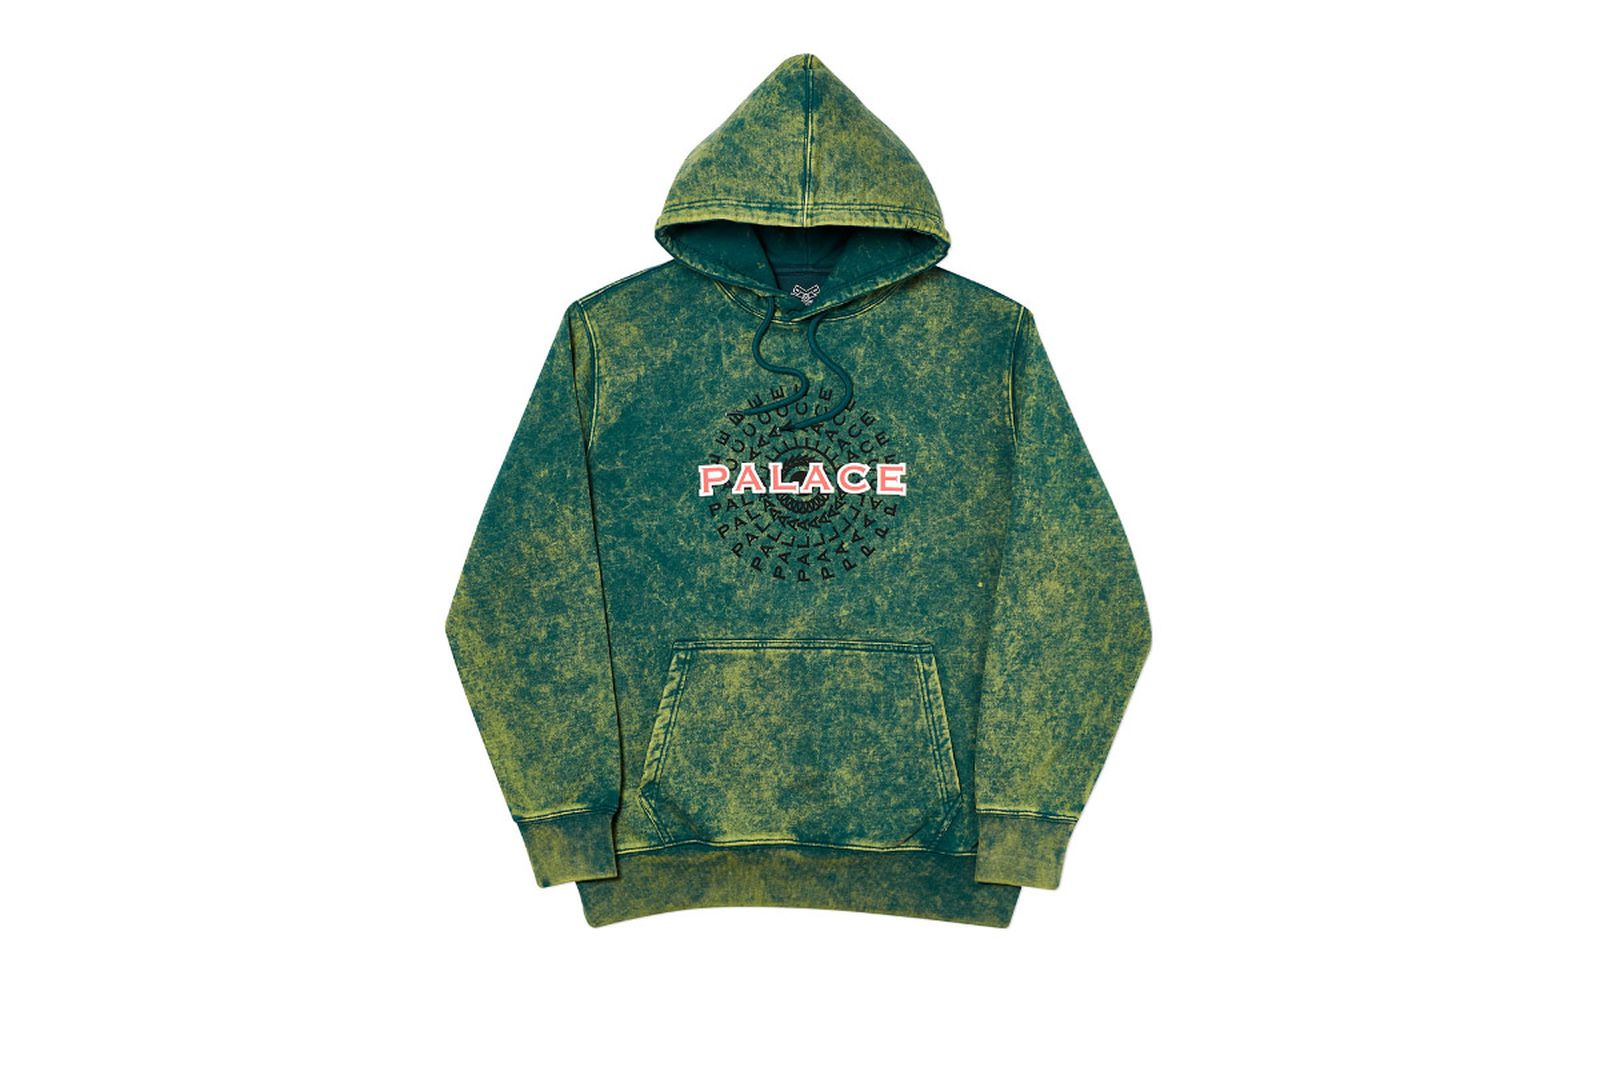 Palace 2019 Autumn Hood Piricle Acid Wash Green Front